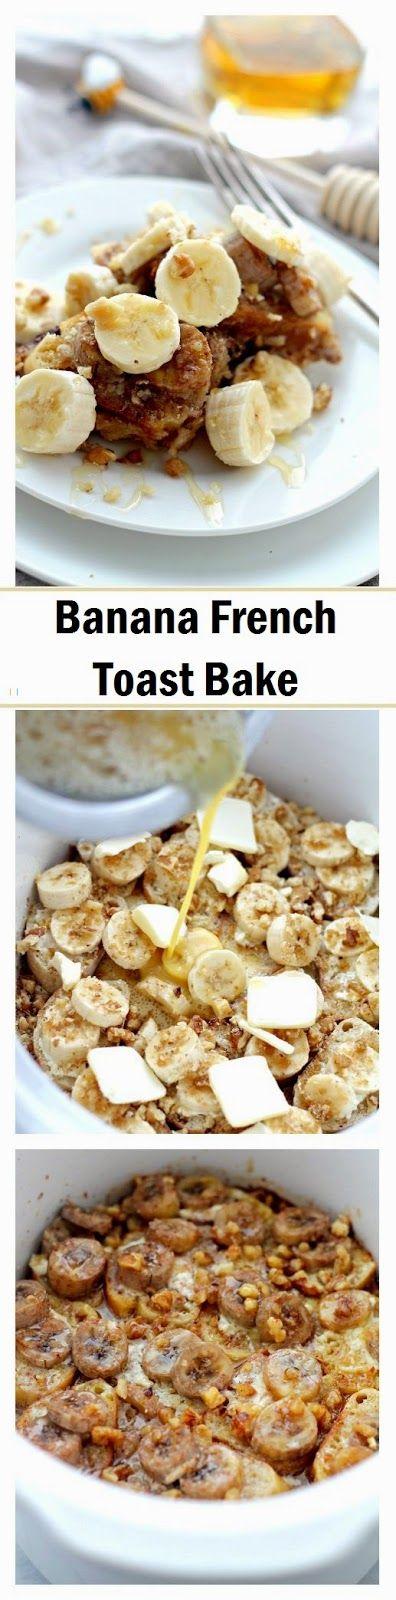 How to make #Banana #French Toast #Bake http://littlefattys.blogspot.com/2014/12/banana-french-toast-bake.html